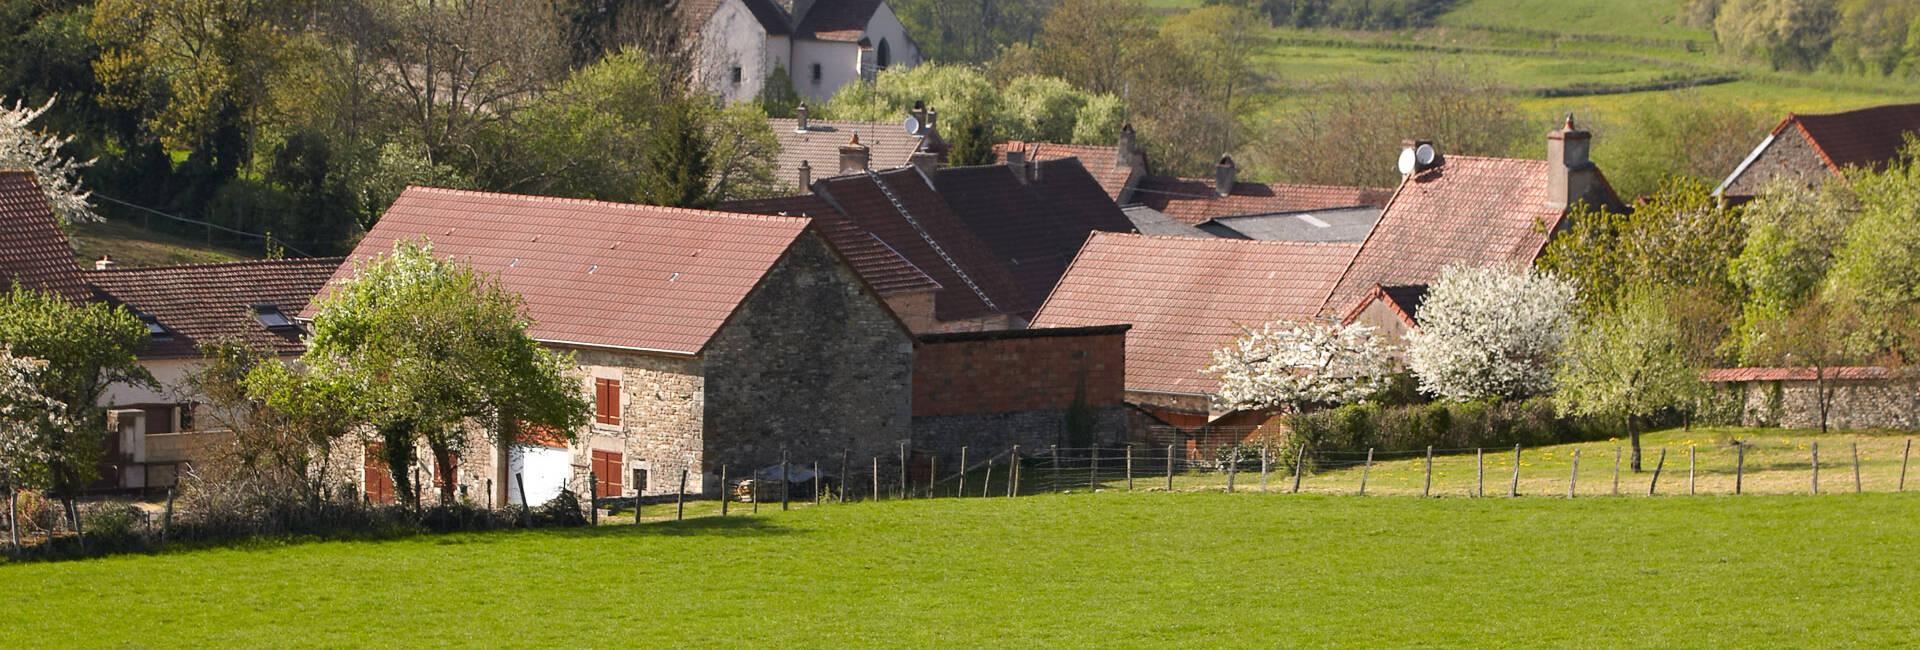 Villages, Burgundy, France © Atelier Photos Muzard